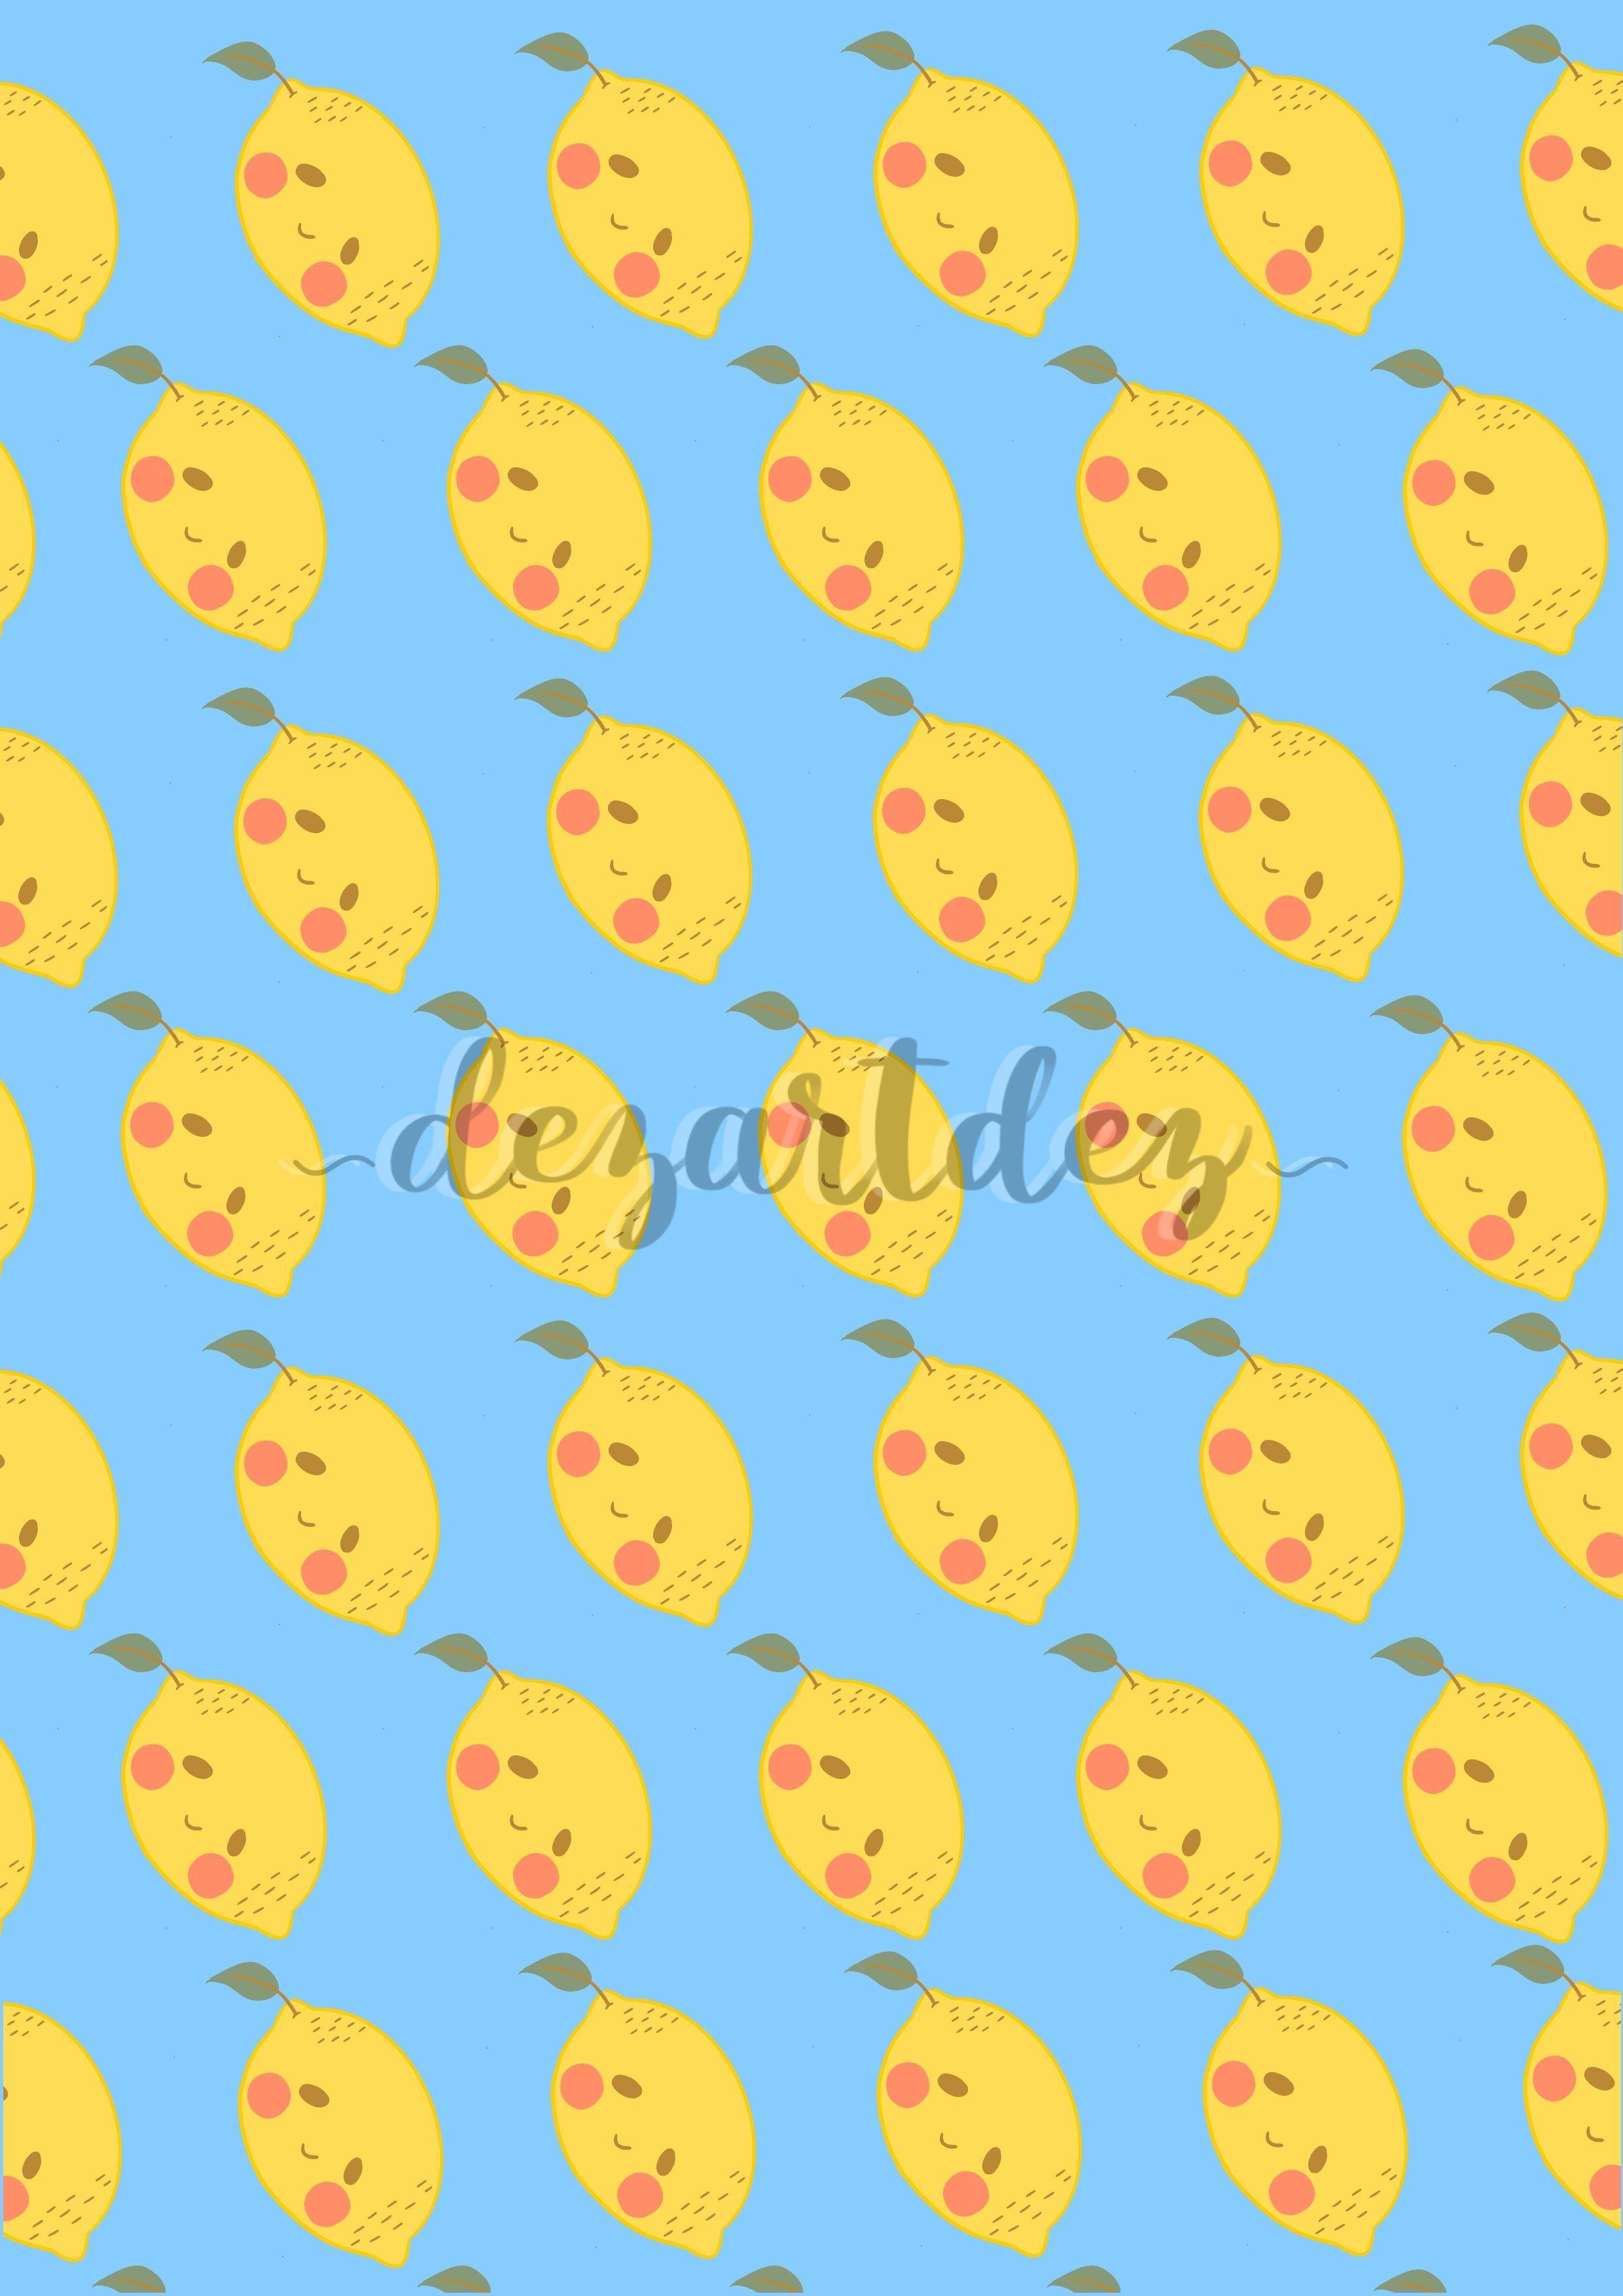 Cute Lemon Boy Blue Digital Print Kawaii Digital Art Print Phone Wallpaper Ipad Background Digital Art Prints Cute Emoji Wallpaper Cute Pokemon Wallpaper